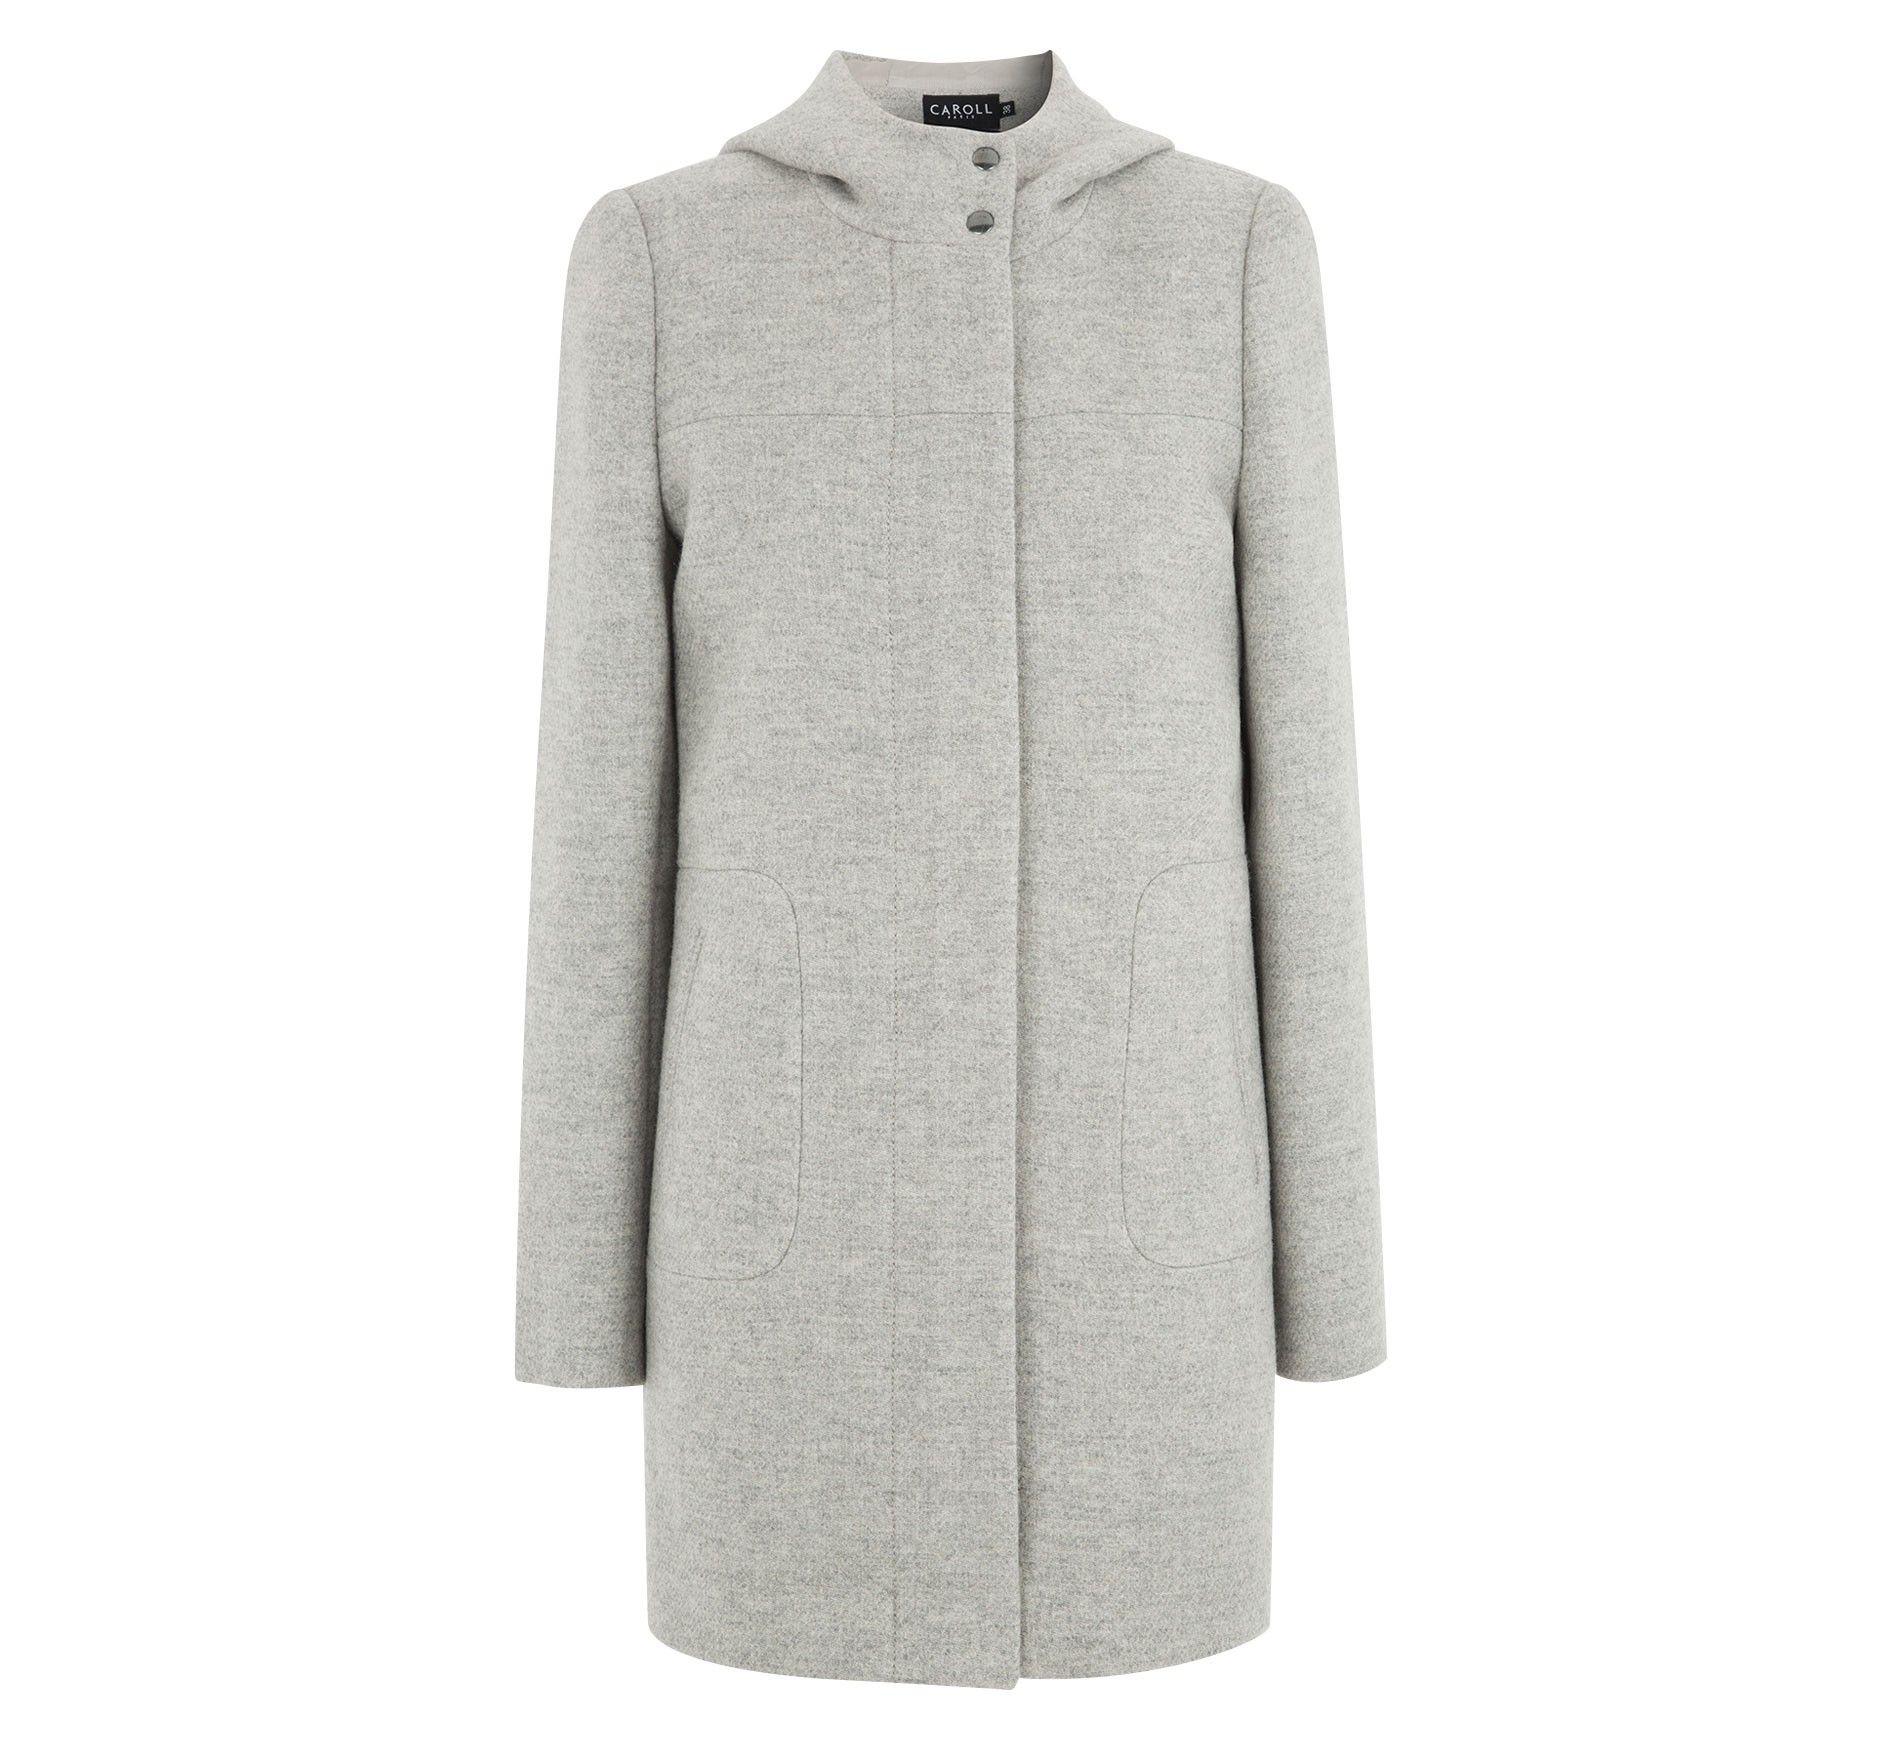 Manteau doudoune femme caroll